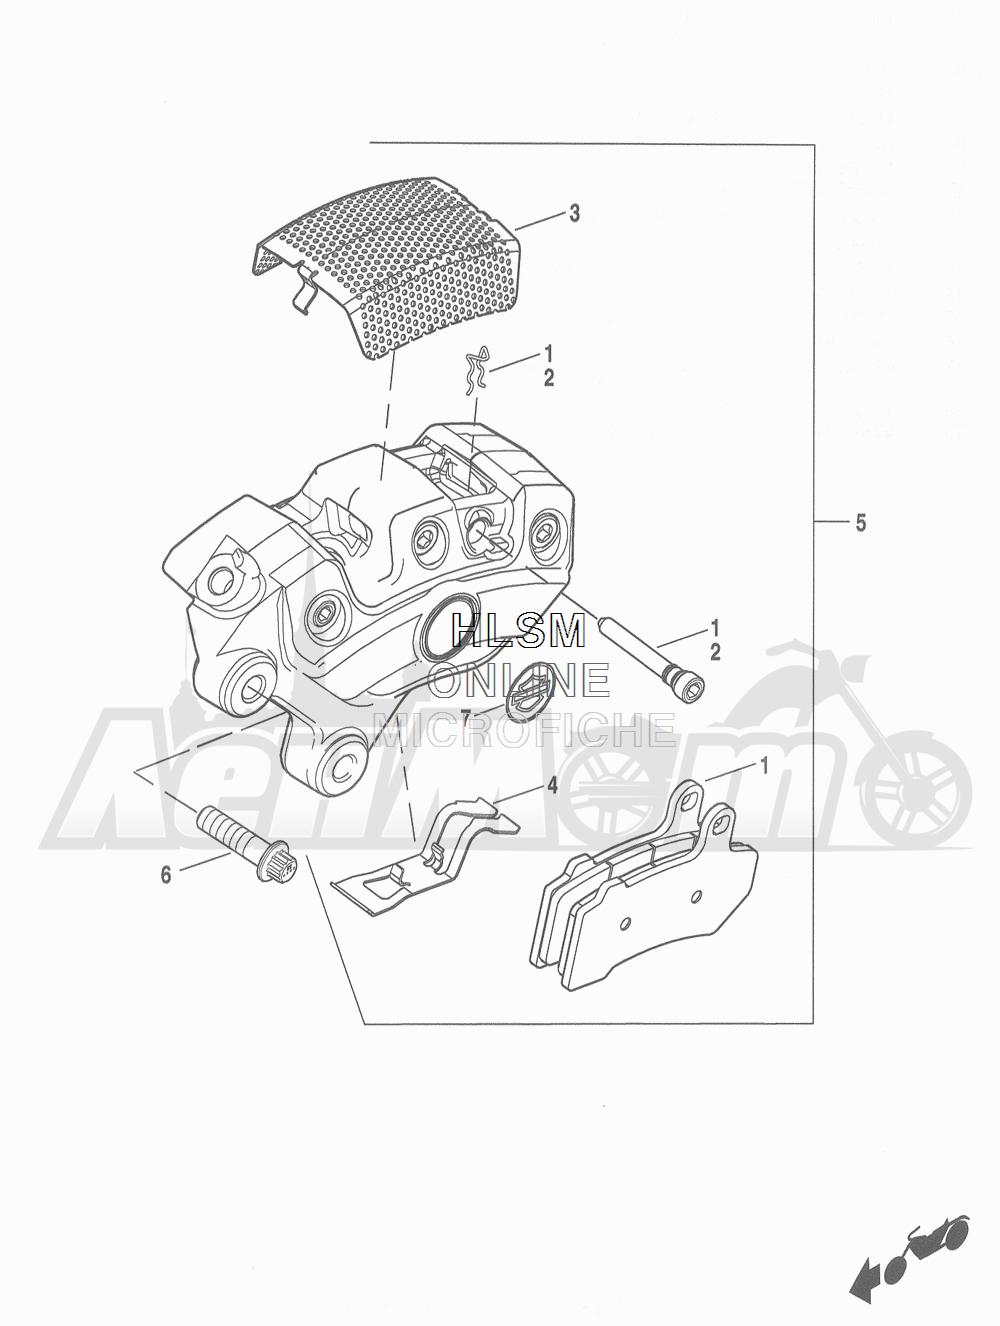 Запчасти для Мотоцикла Harley-Davidson 2016 FLHTCU TC ELECTRA GLIDE ULTRA CLASSIC (KSL) Раздел: BRAKE - FRONT BRAKE CALIPER ASSEMBLY | передний тормоз тормозной суппорт в сборе